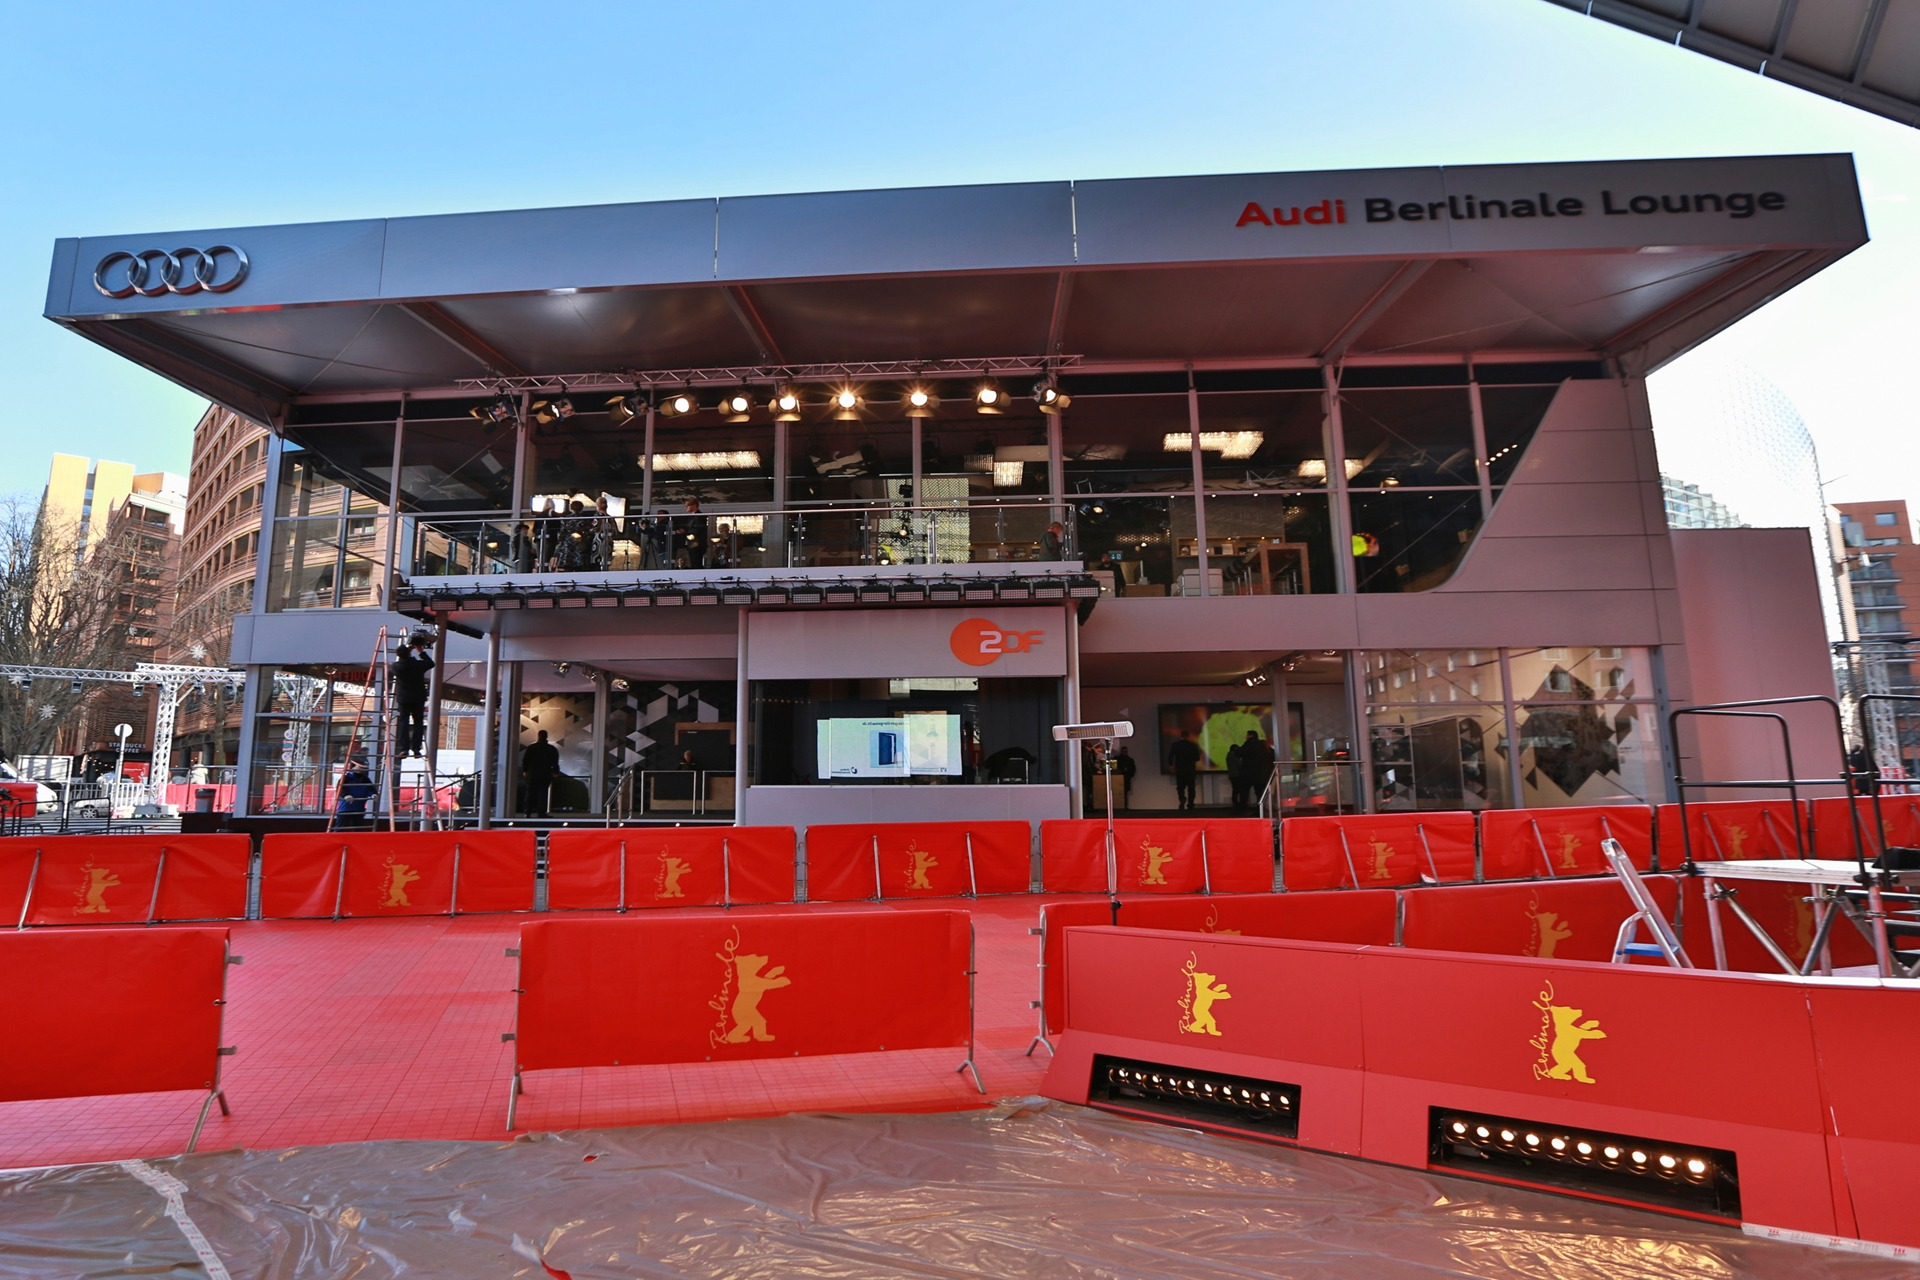 Audi Berlinale Lounge 2014